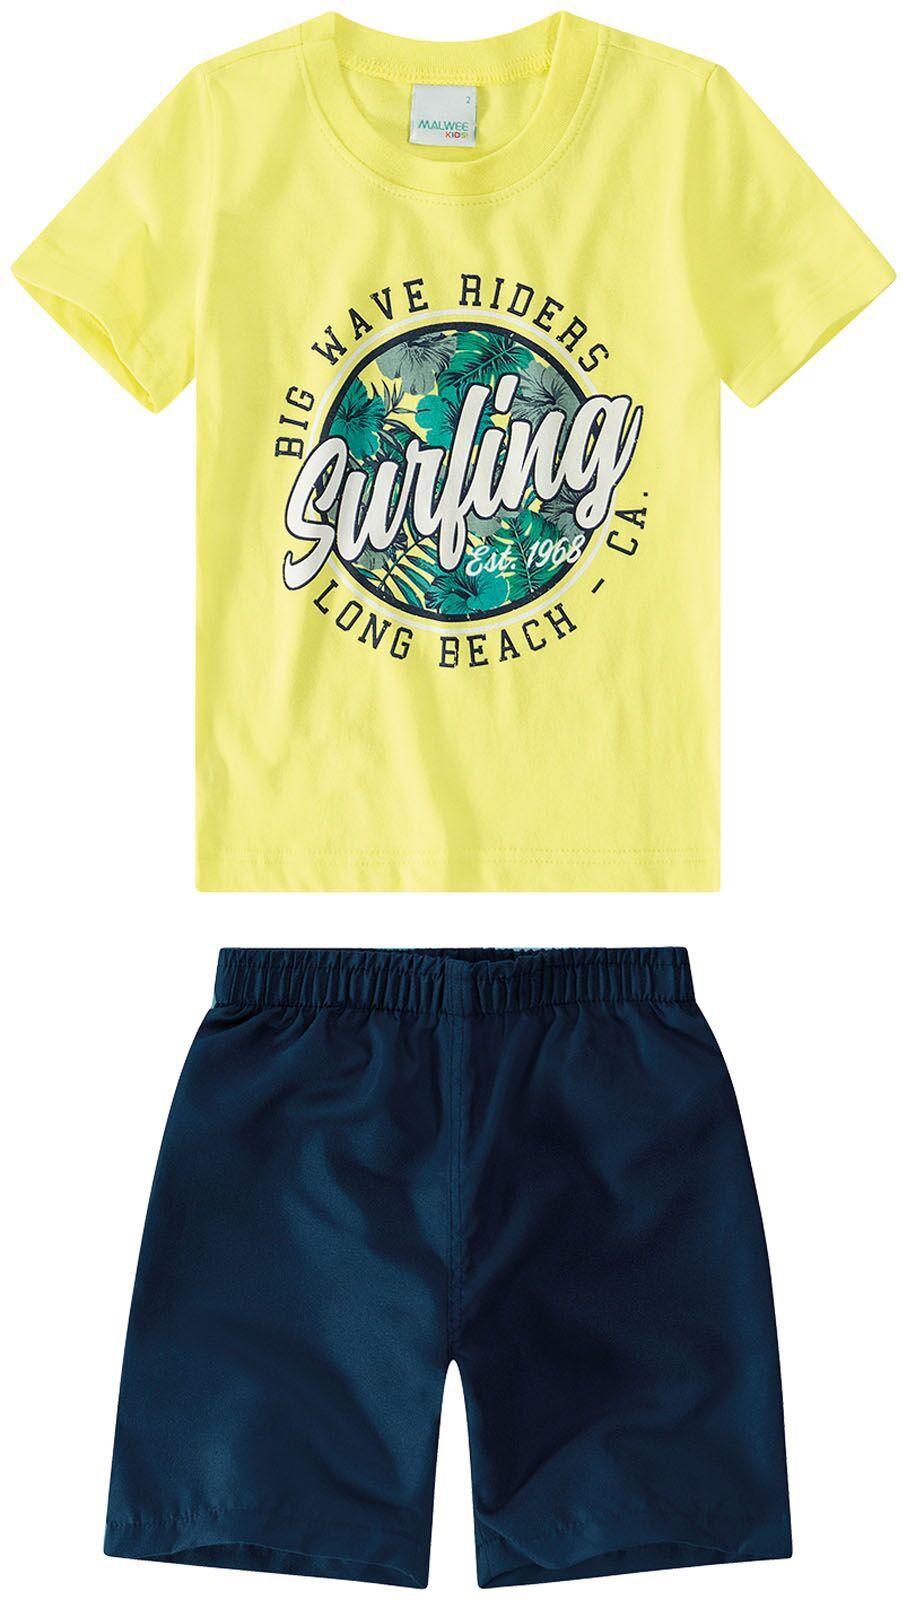 Conjunto Camiseta + Bermuda - Long Beach - Malwee